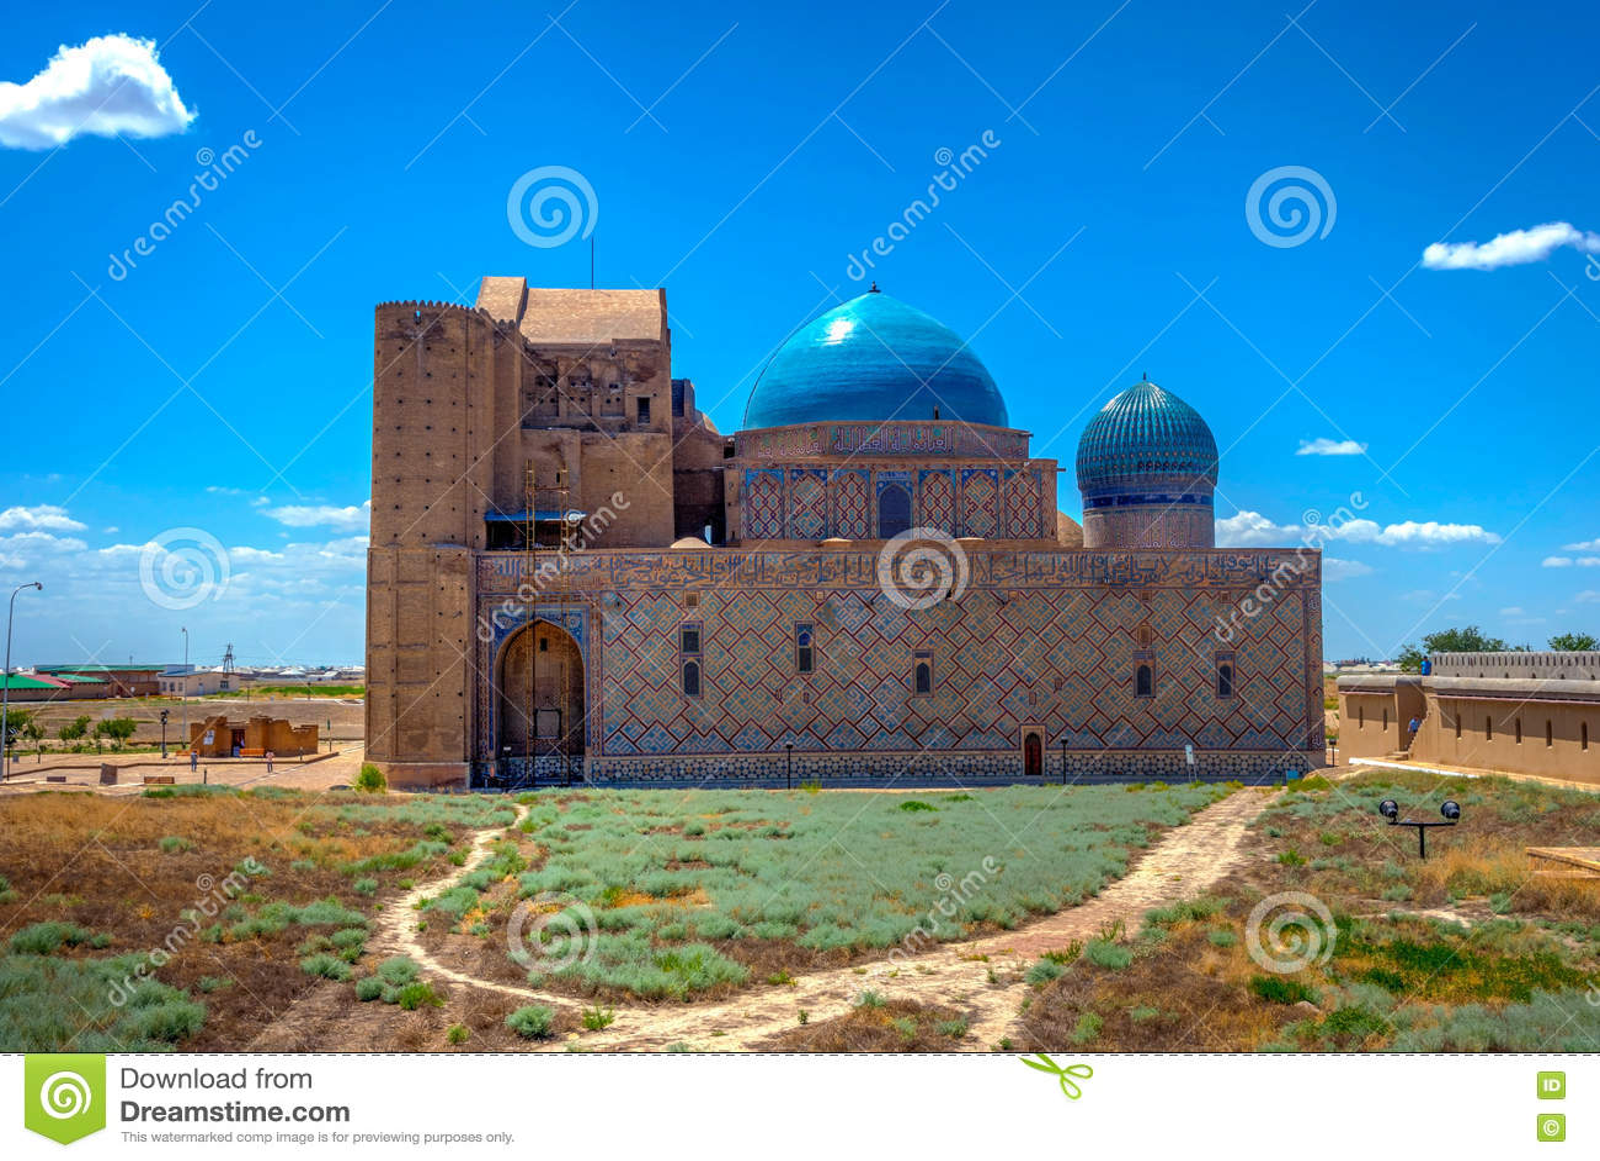 Turkistan陵墓,哈萨克斯坦